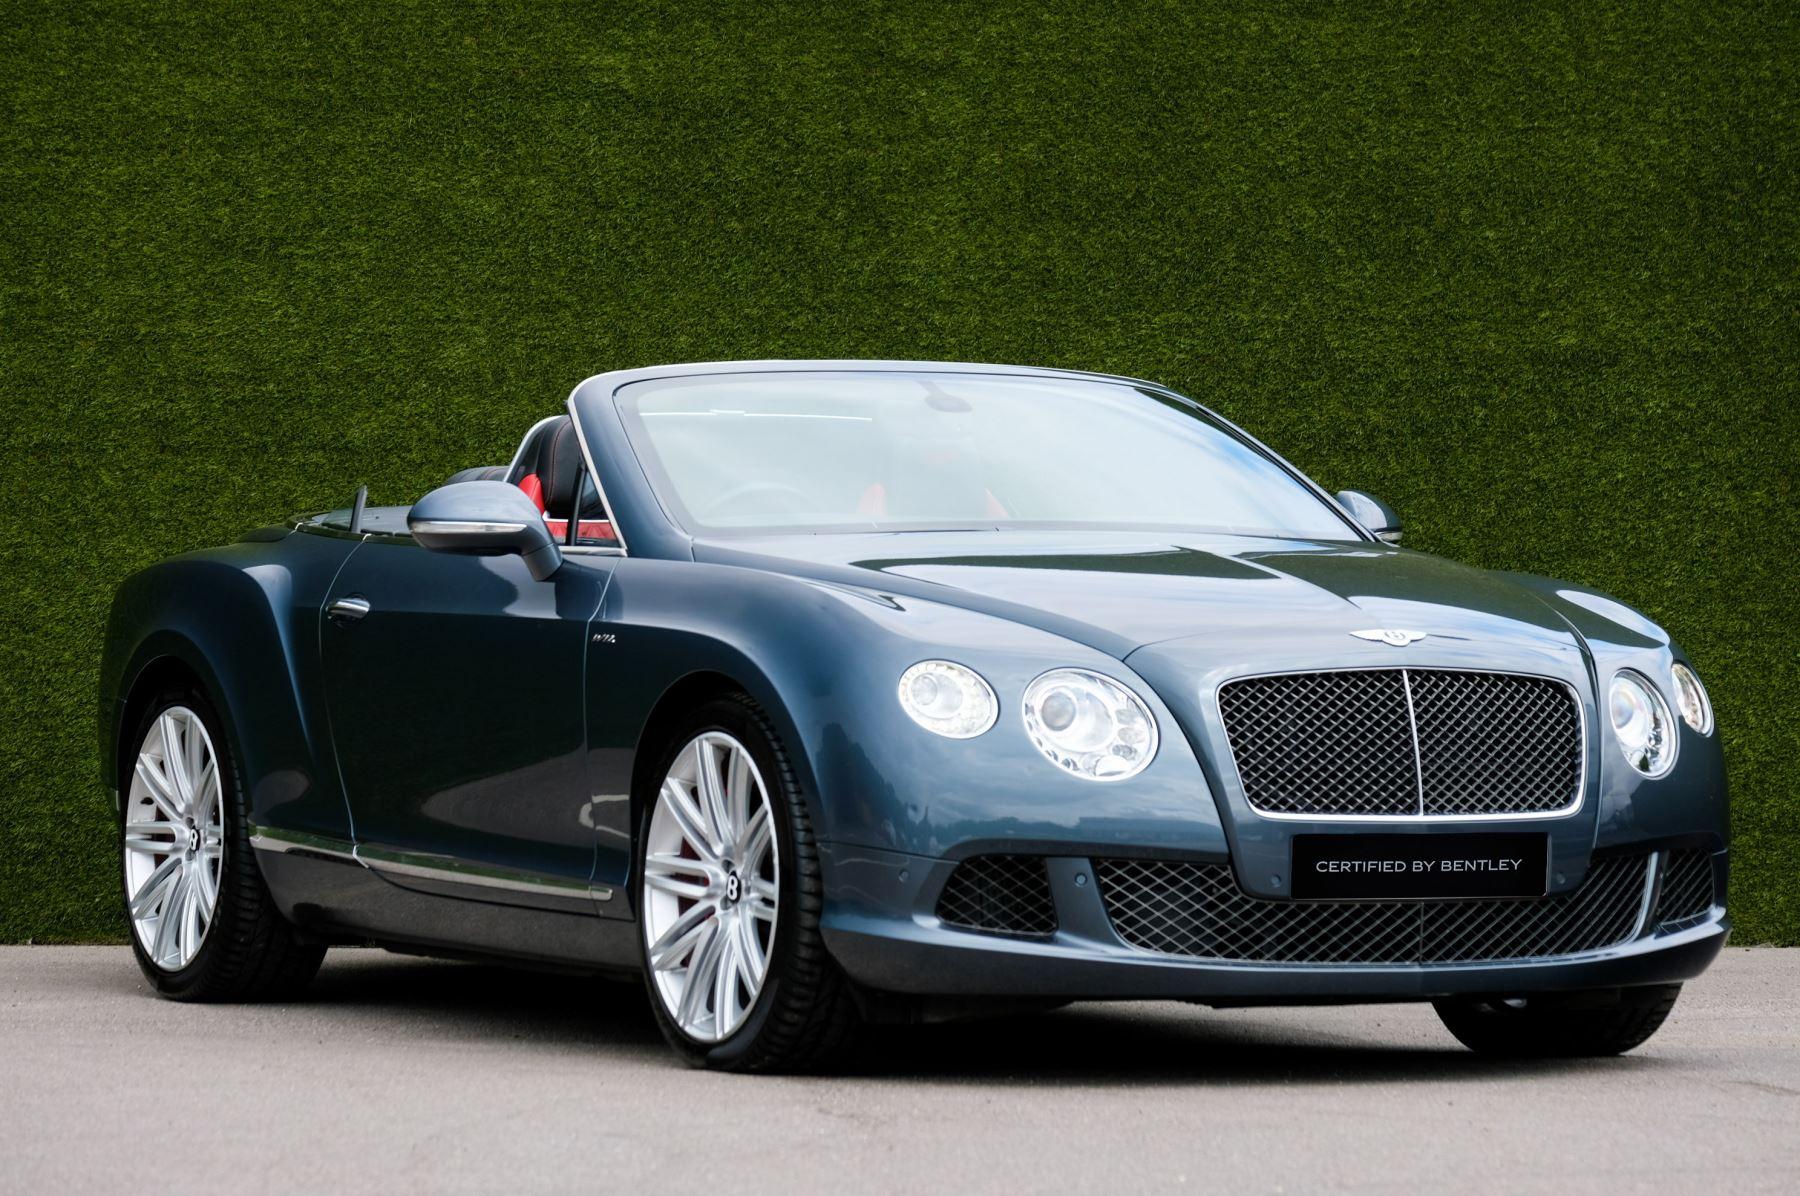 Bentley Continental GTC 6.0 W12 Speed - Massage Seats & Ventilation - Neck Warmer - Rear View Camera Automatic 2 door Convertible